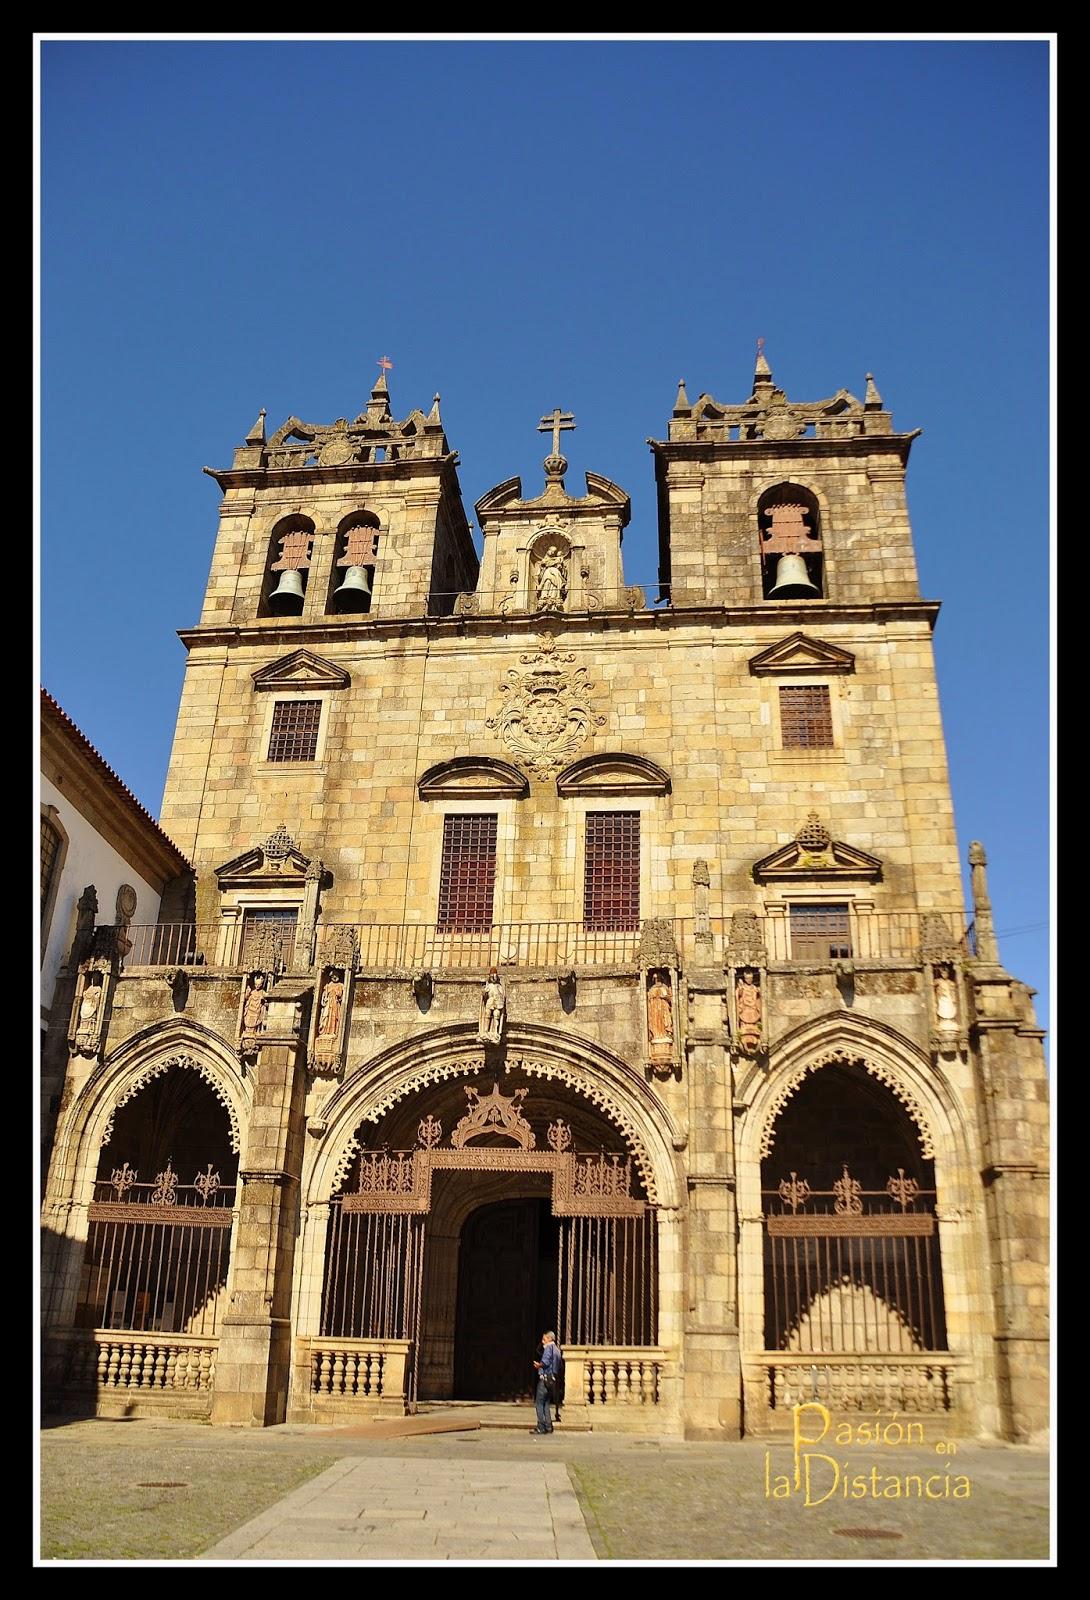 Fachada_Sé-Catedral_Braga